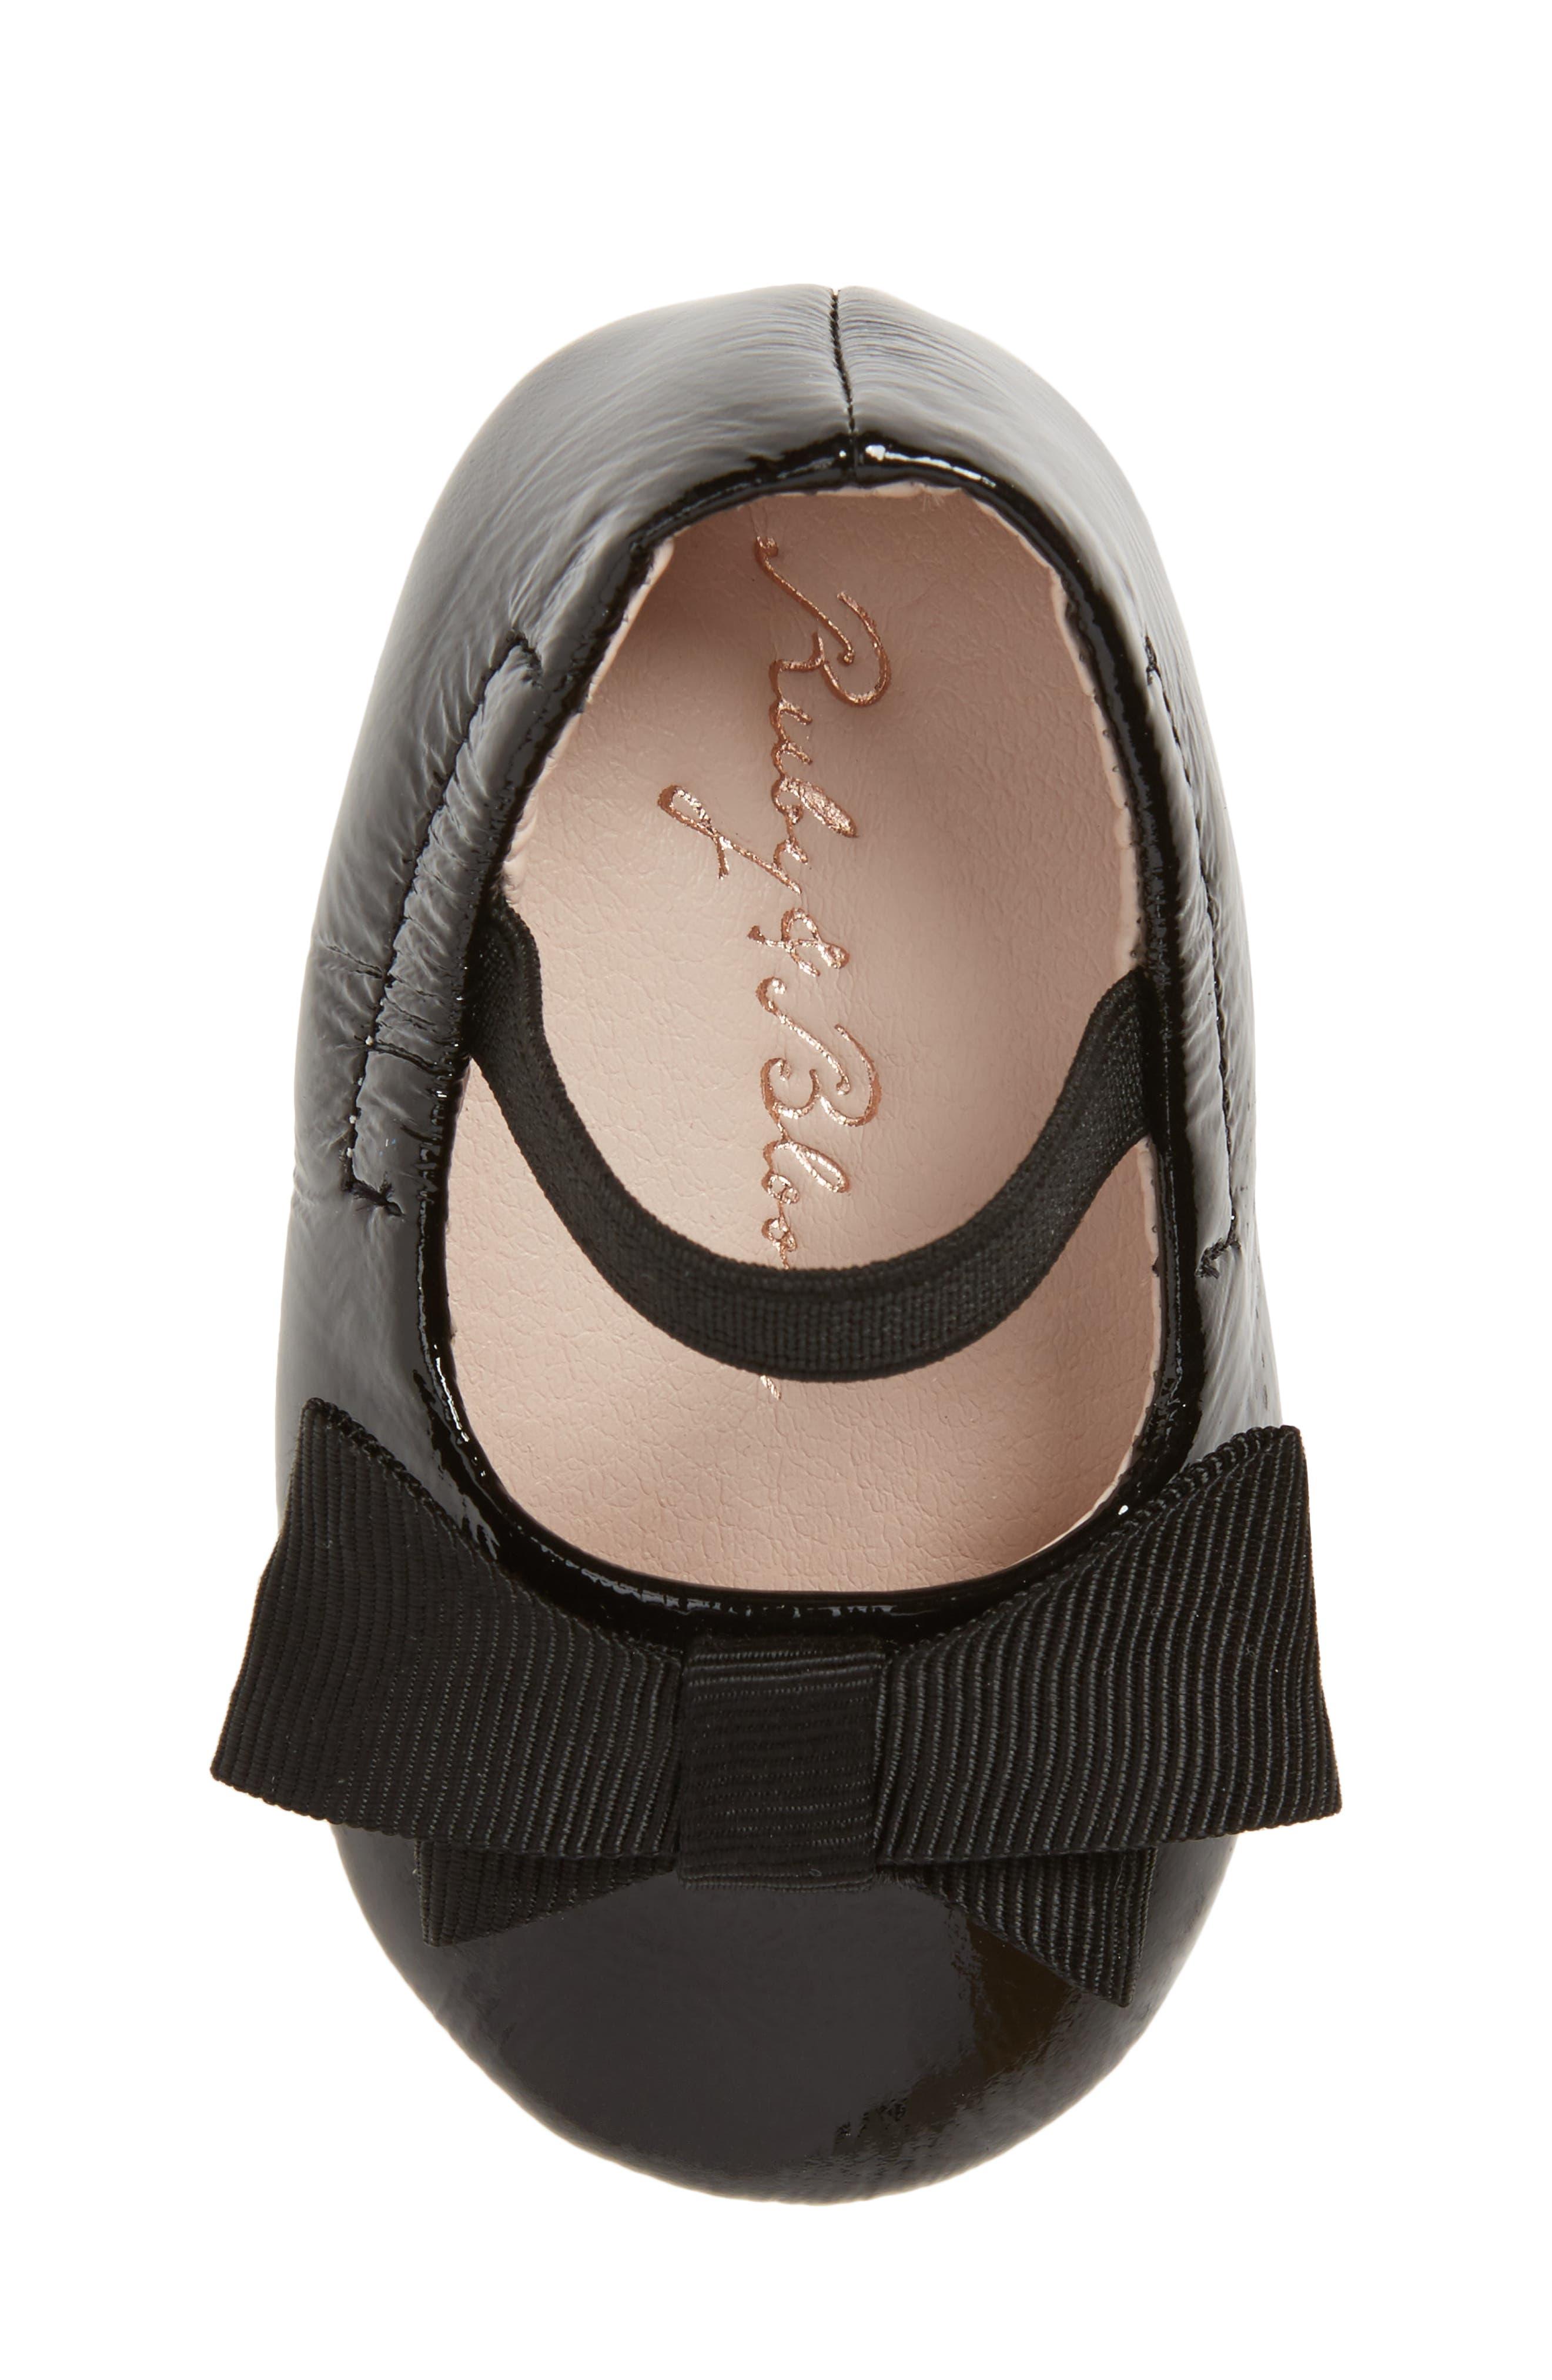 Lilia Mary Jane Flat,                             Alternate thumbnail 5, color,                             Black Patent Leather